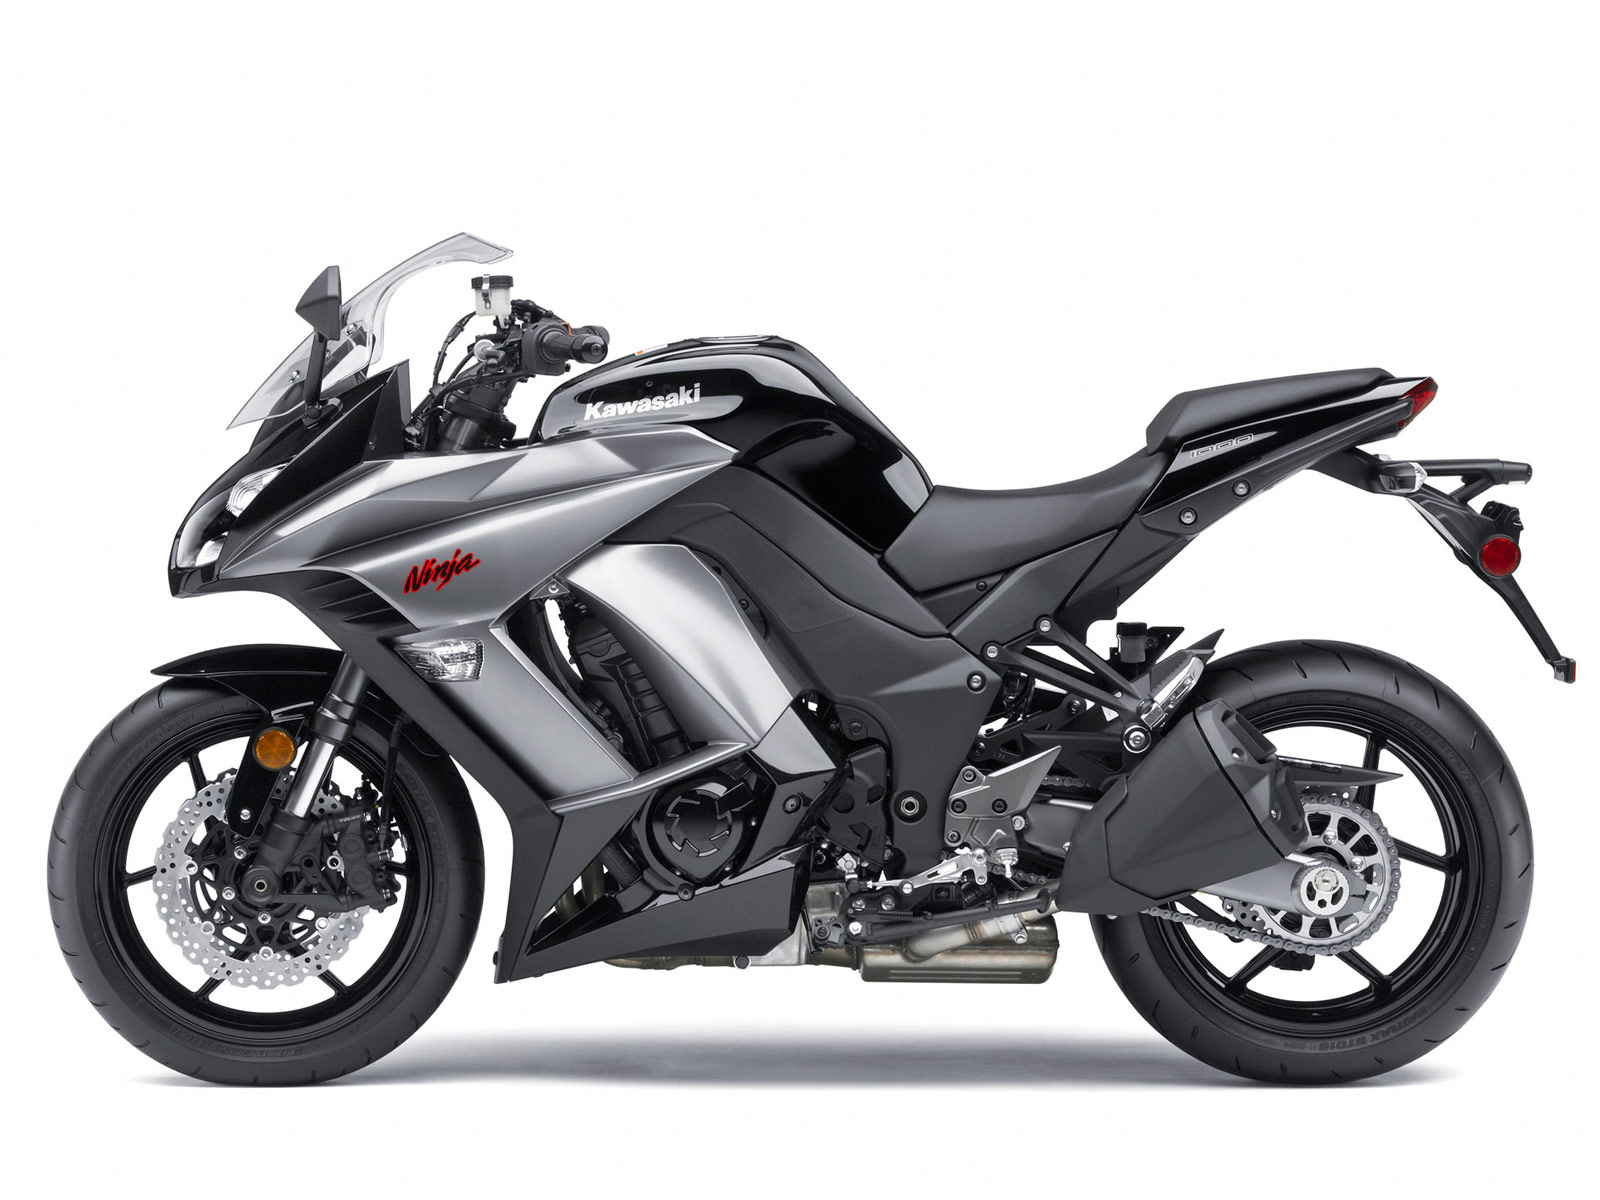 http://1.bp.blogspot.com/-ZdkqRYFjs4s/TwwM6wj_ZII/AAAAAAAAKEs/nSdfna2s9E8/s1600/2012-Kawasaki-Ninja-1000-ABS_motorcycle-desktop-wallpaper_1.jpg